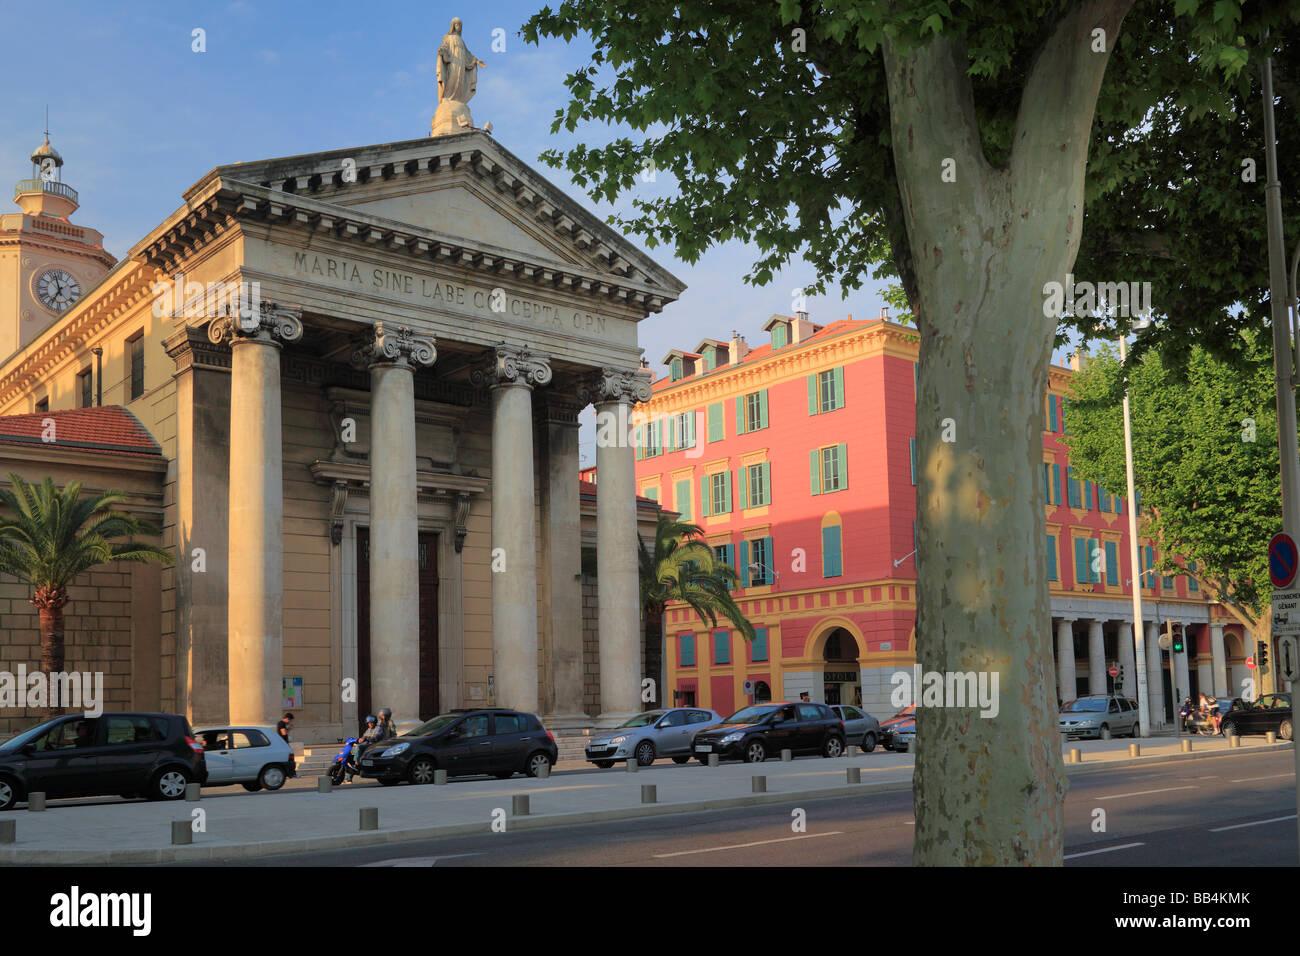 Notre Dame du Port church near the port in Nice Cote d'Azur, France - Stock Image